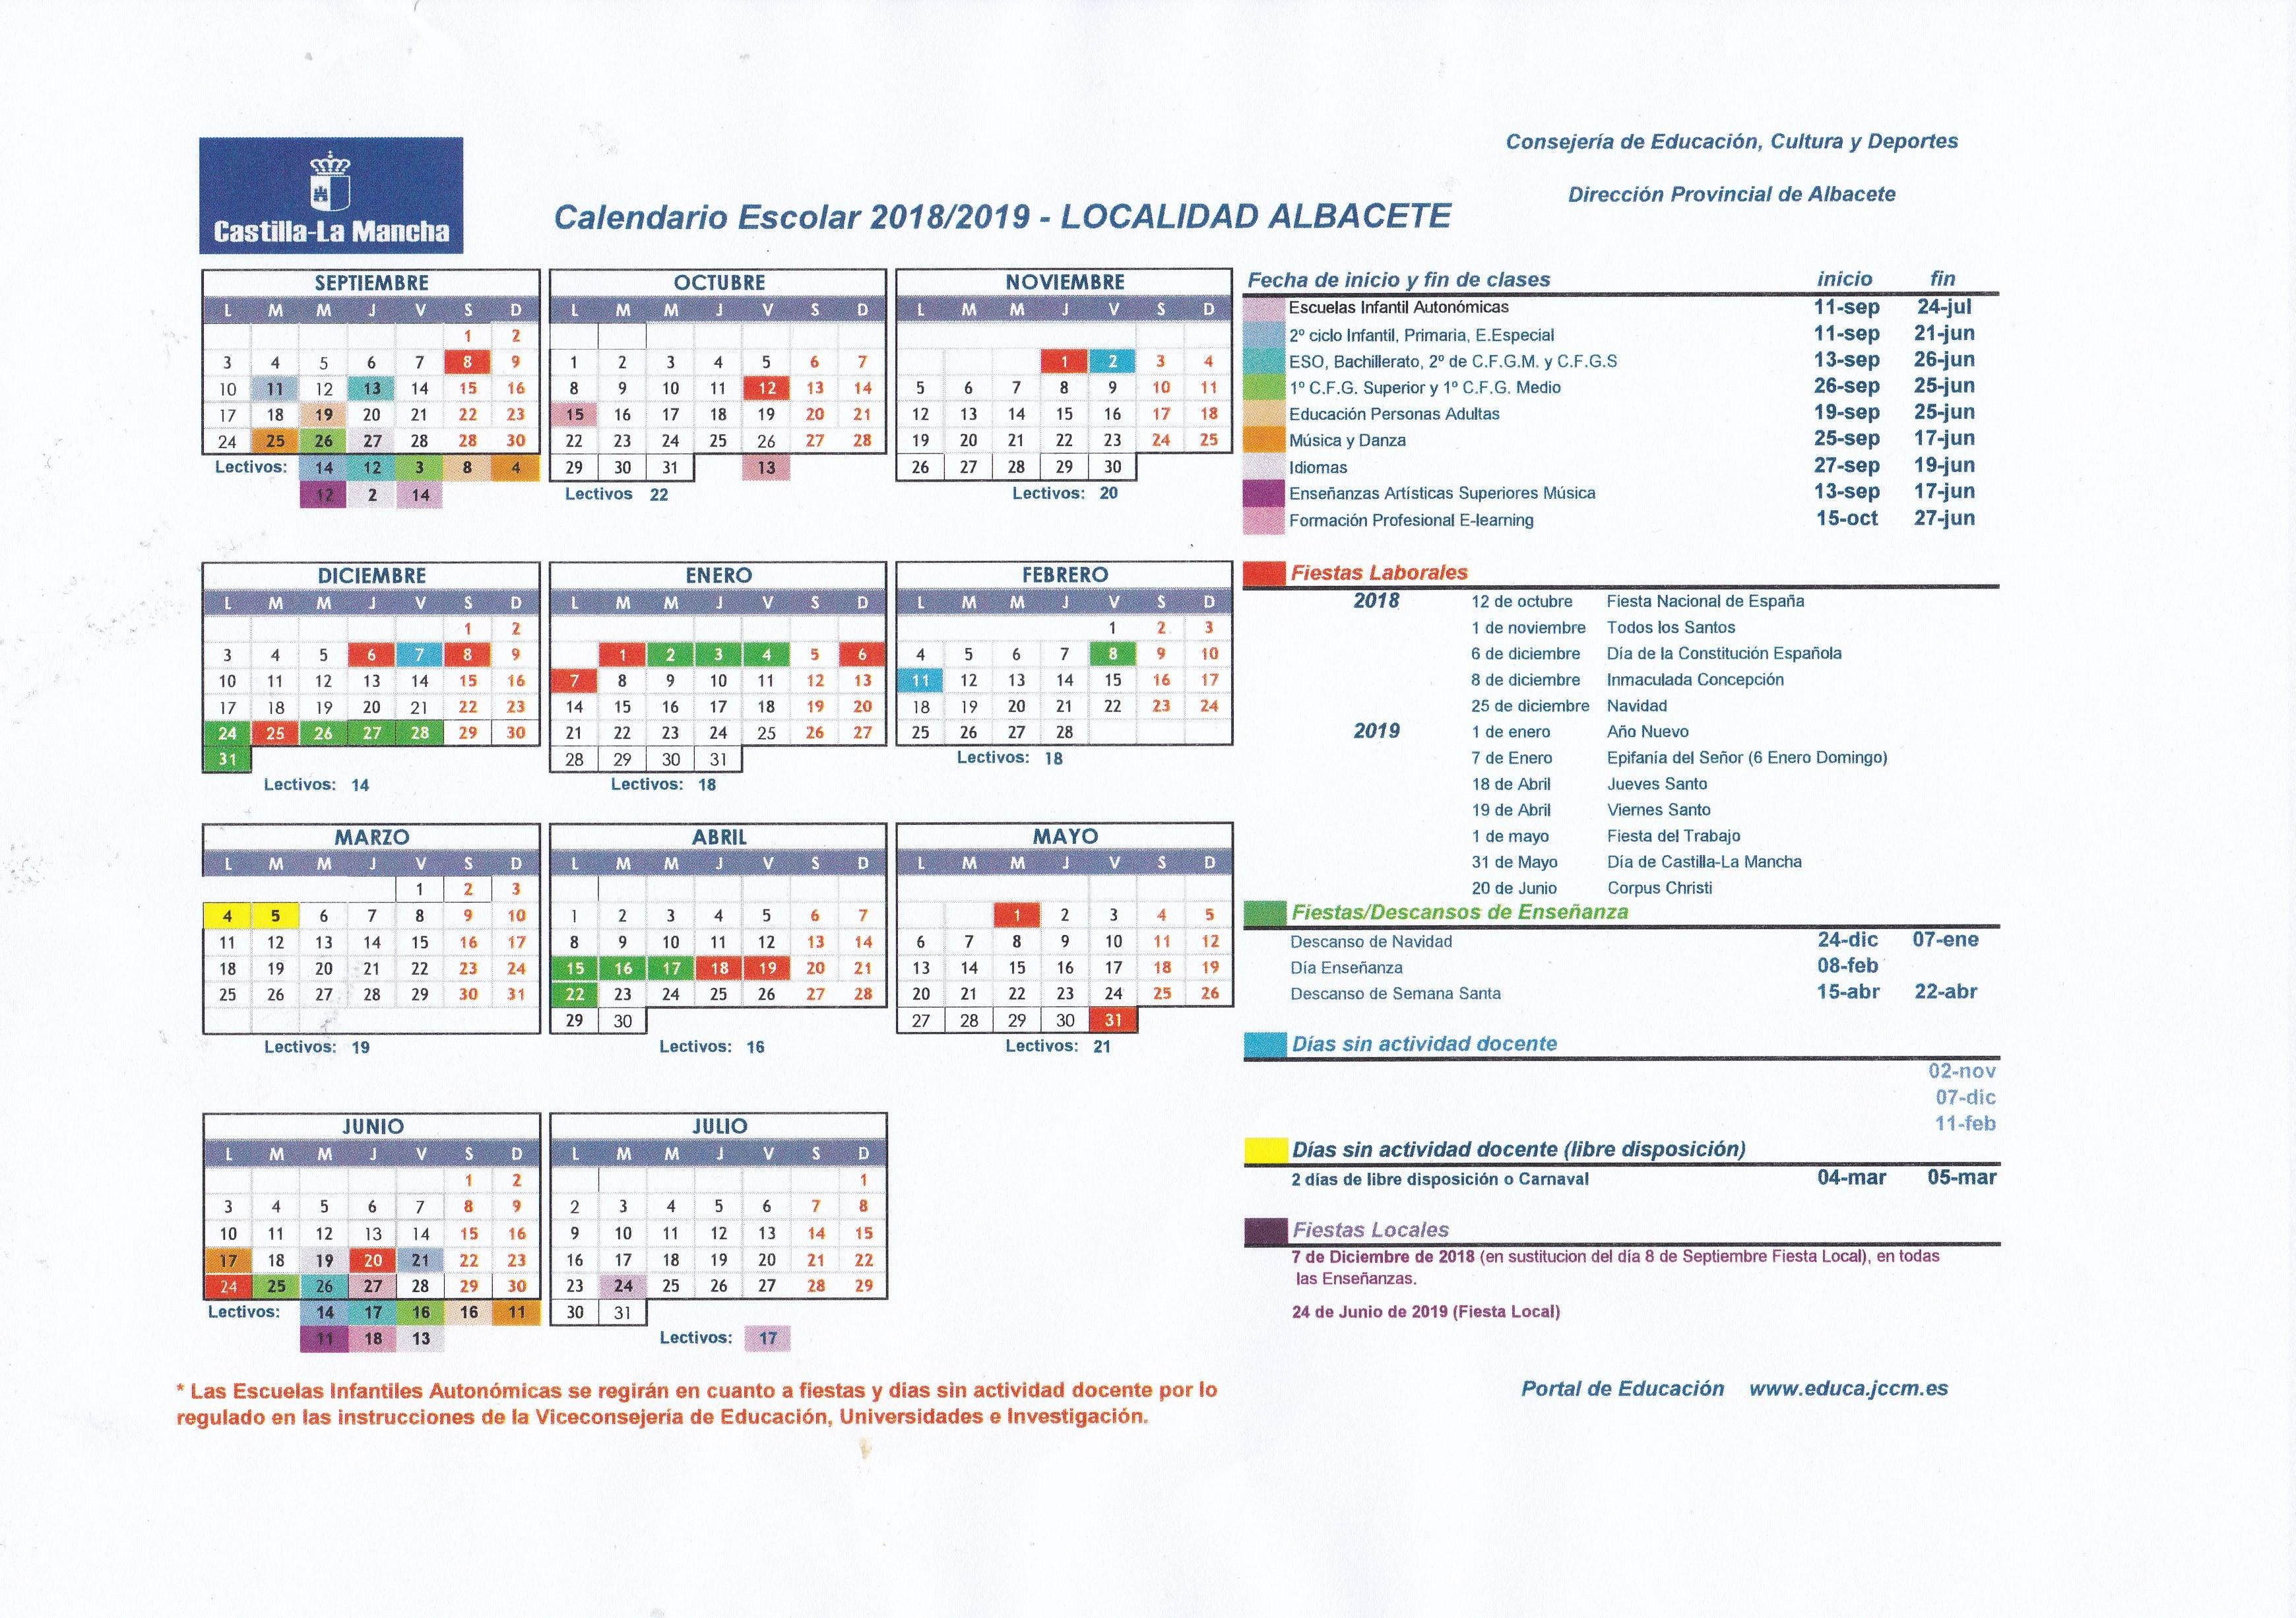 Calendario Escolar 1819.Calendario Escolar 2018 19 Localidad Albacete Ceip Parque Sur